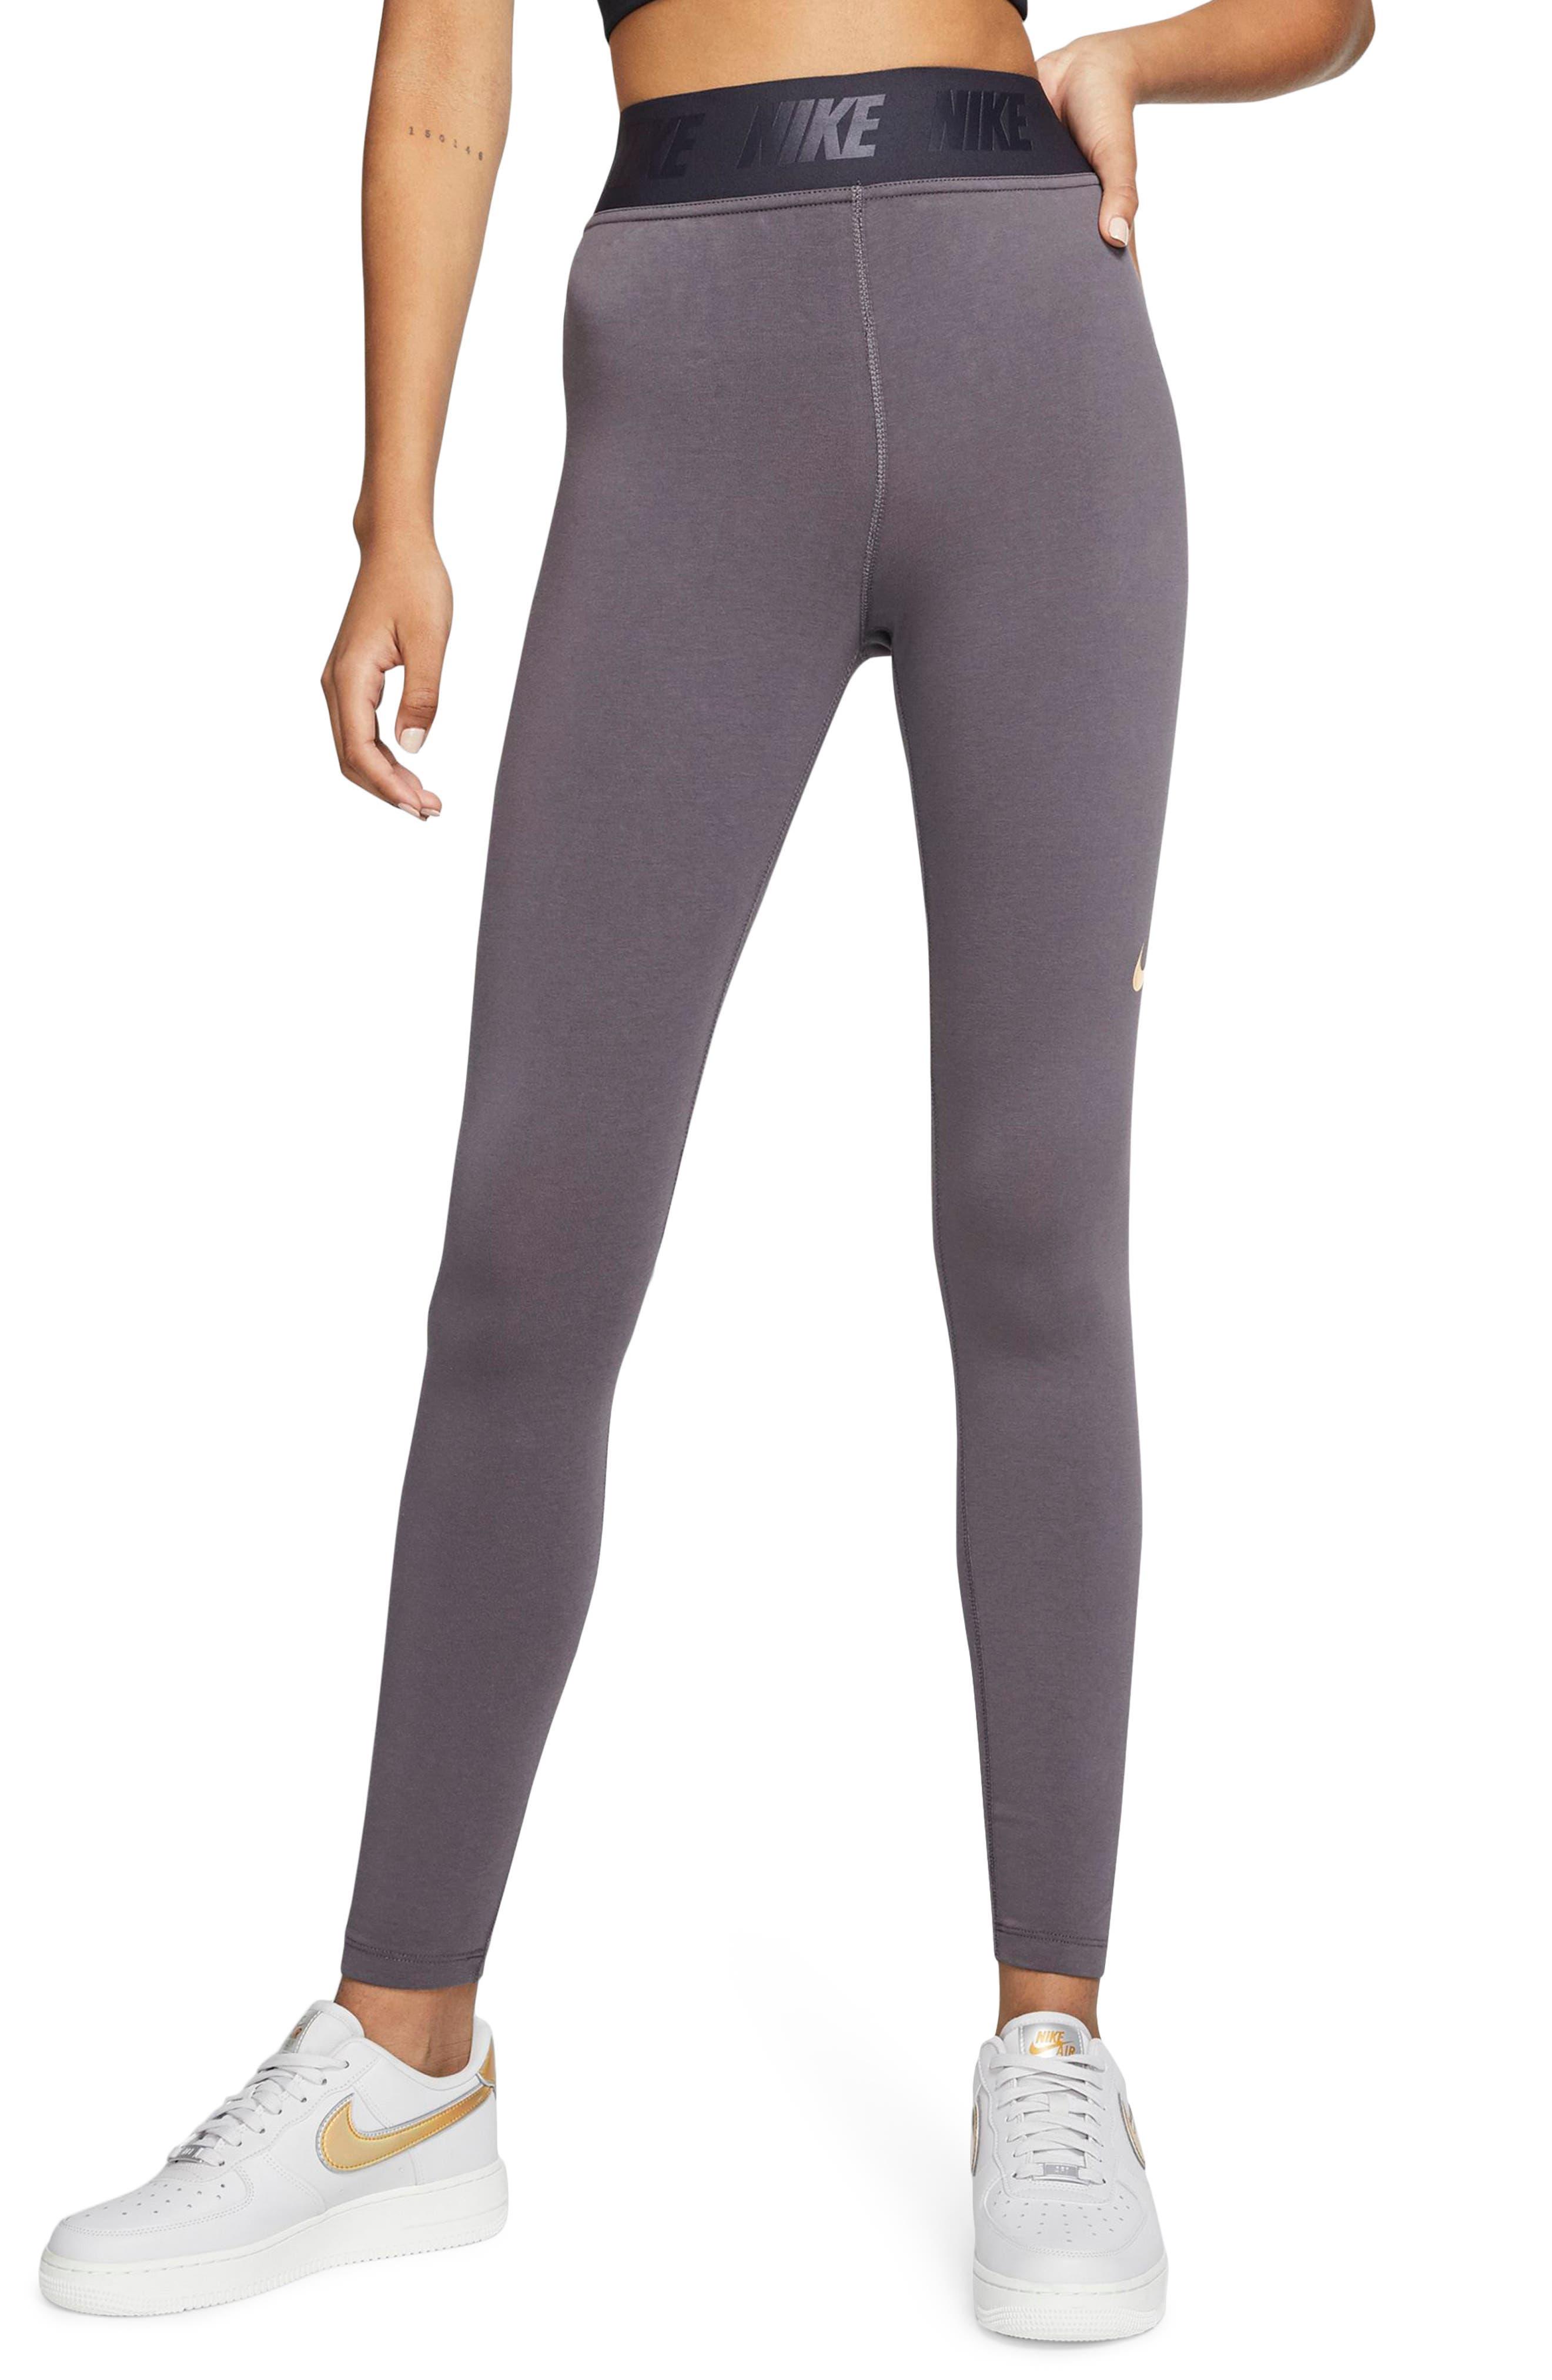 Women's Nike X Maria Sharapova Legasee Leggings